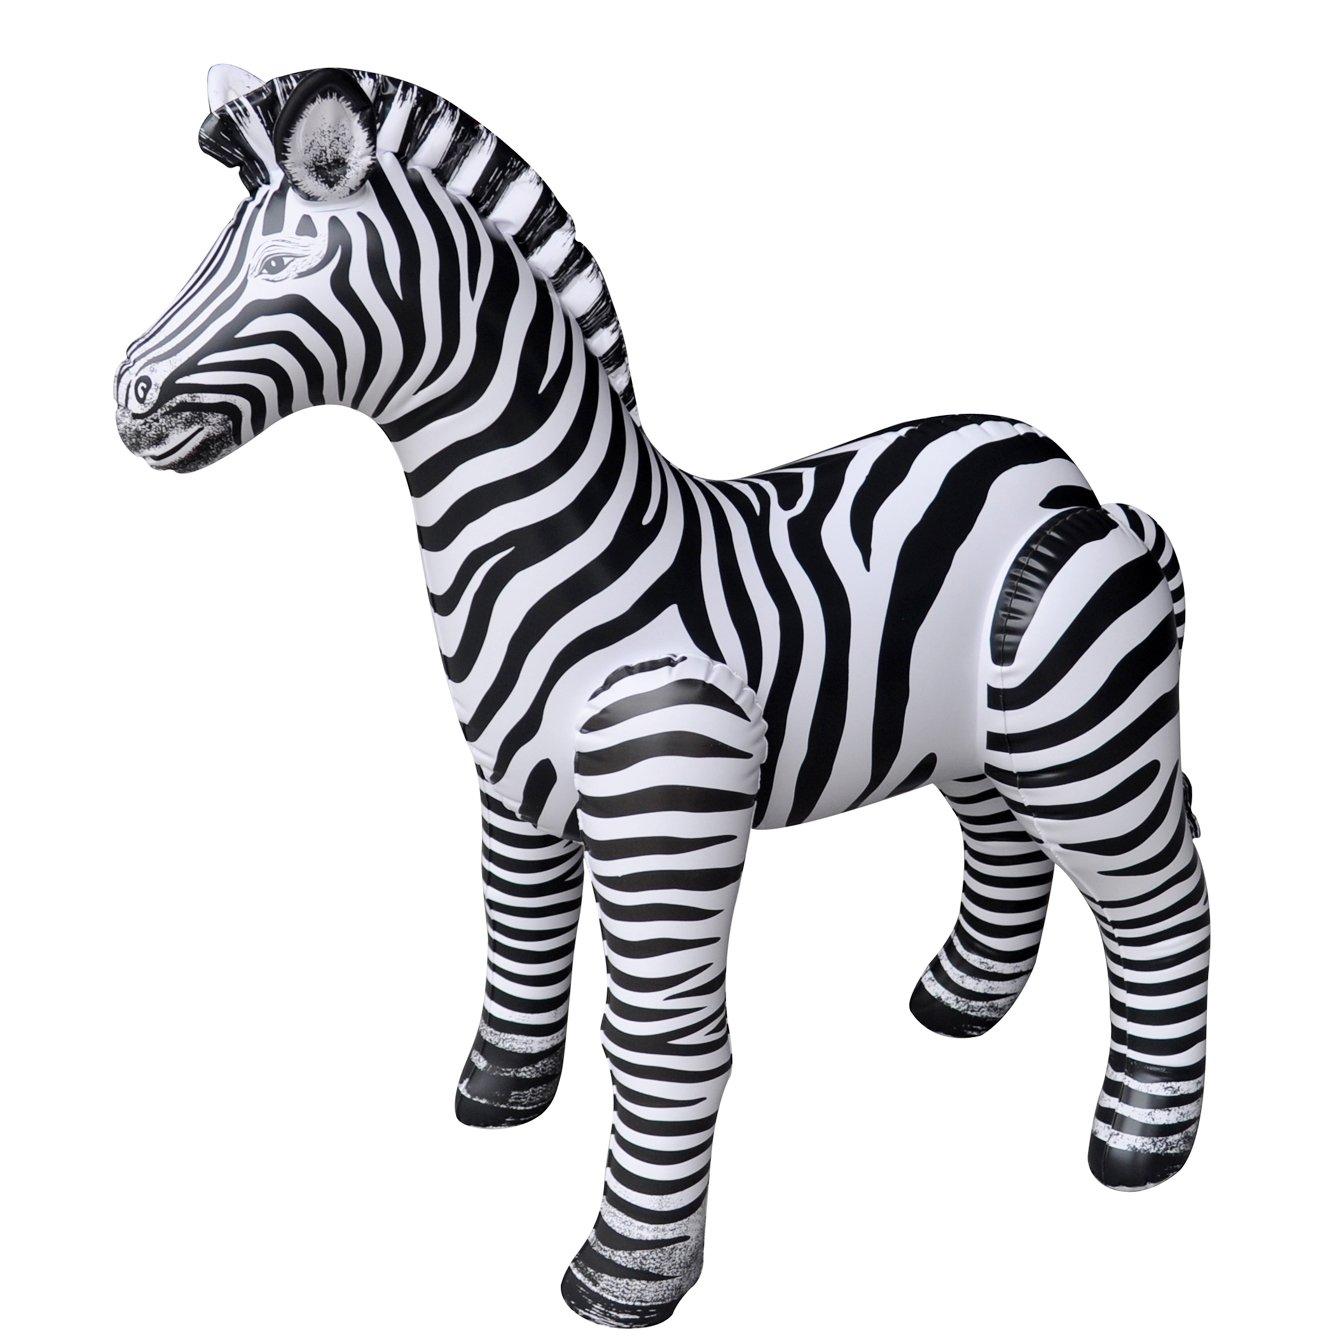 "Jet Creations Inflatable Zebra, 32"" Stuffed Animals"